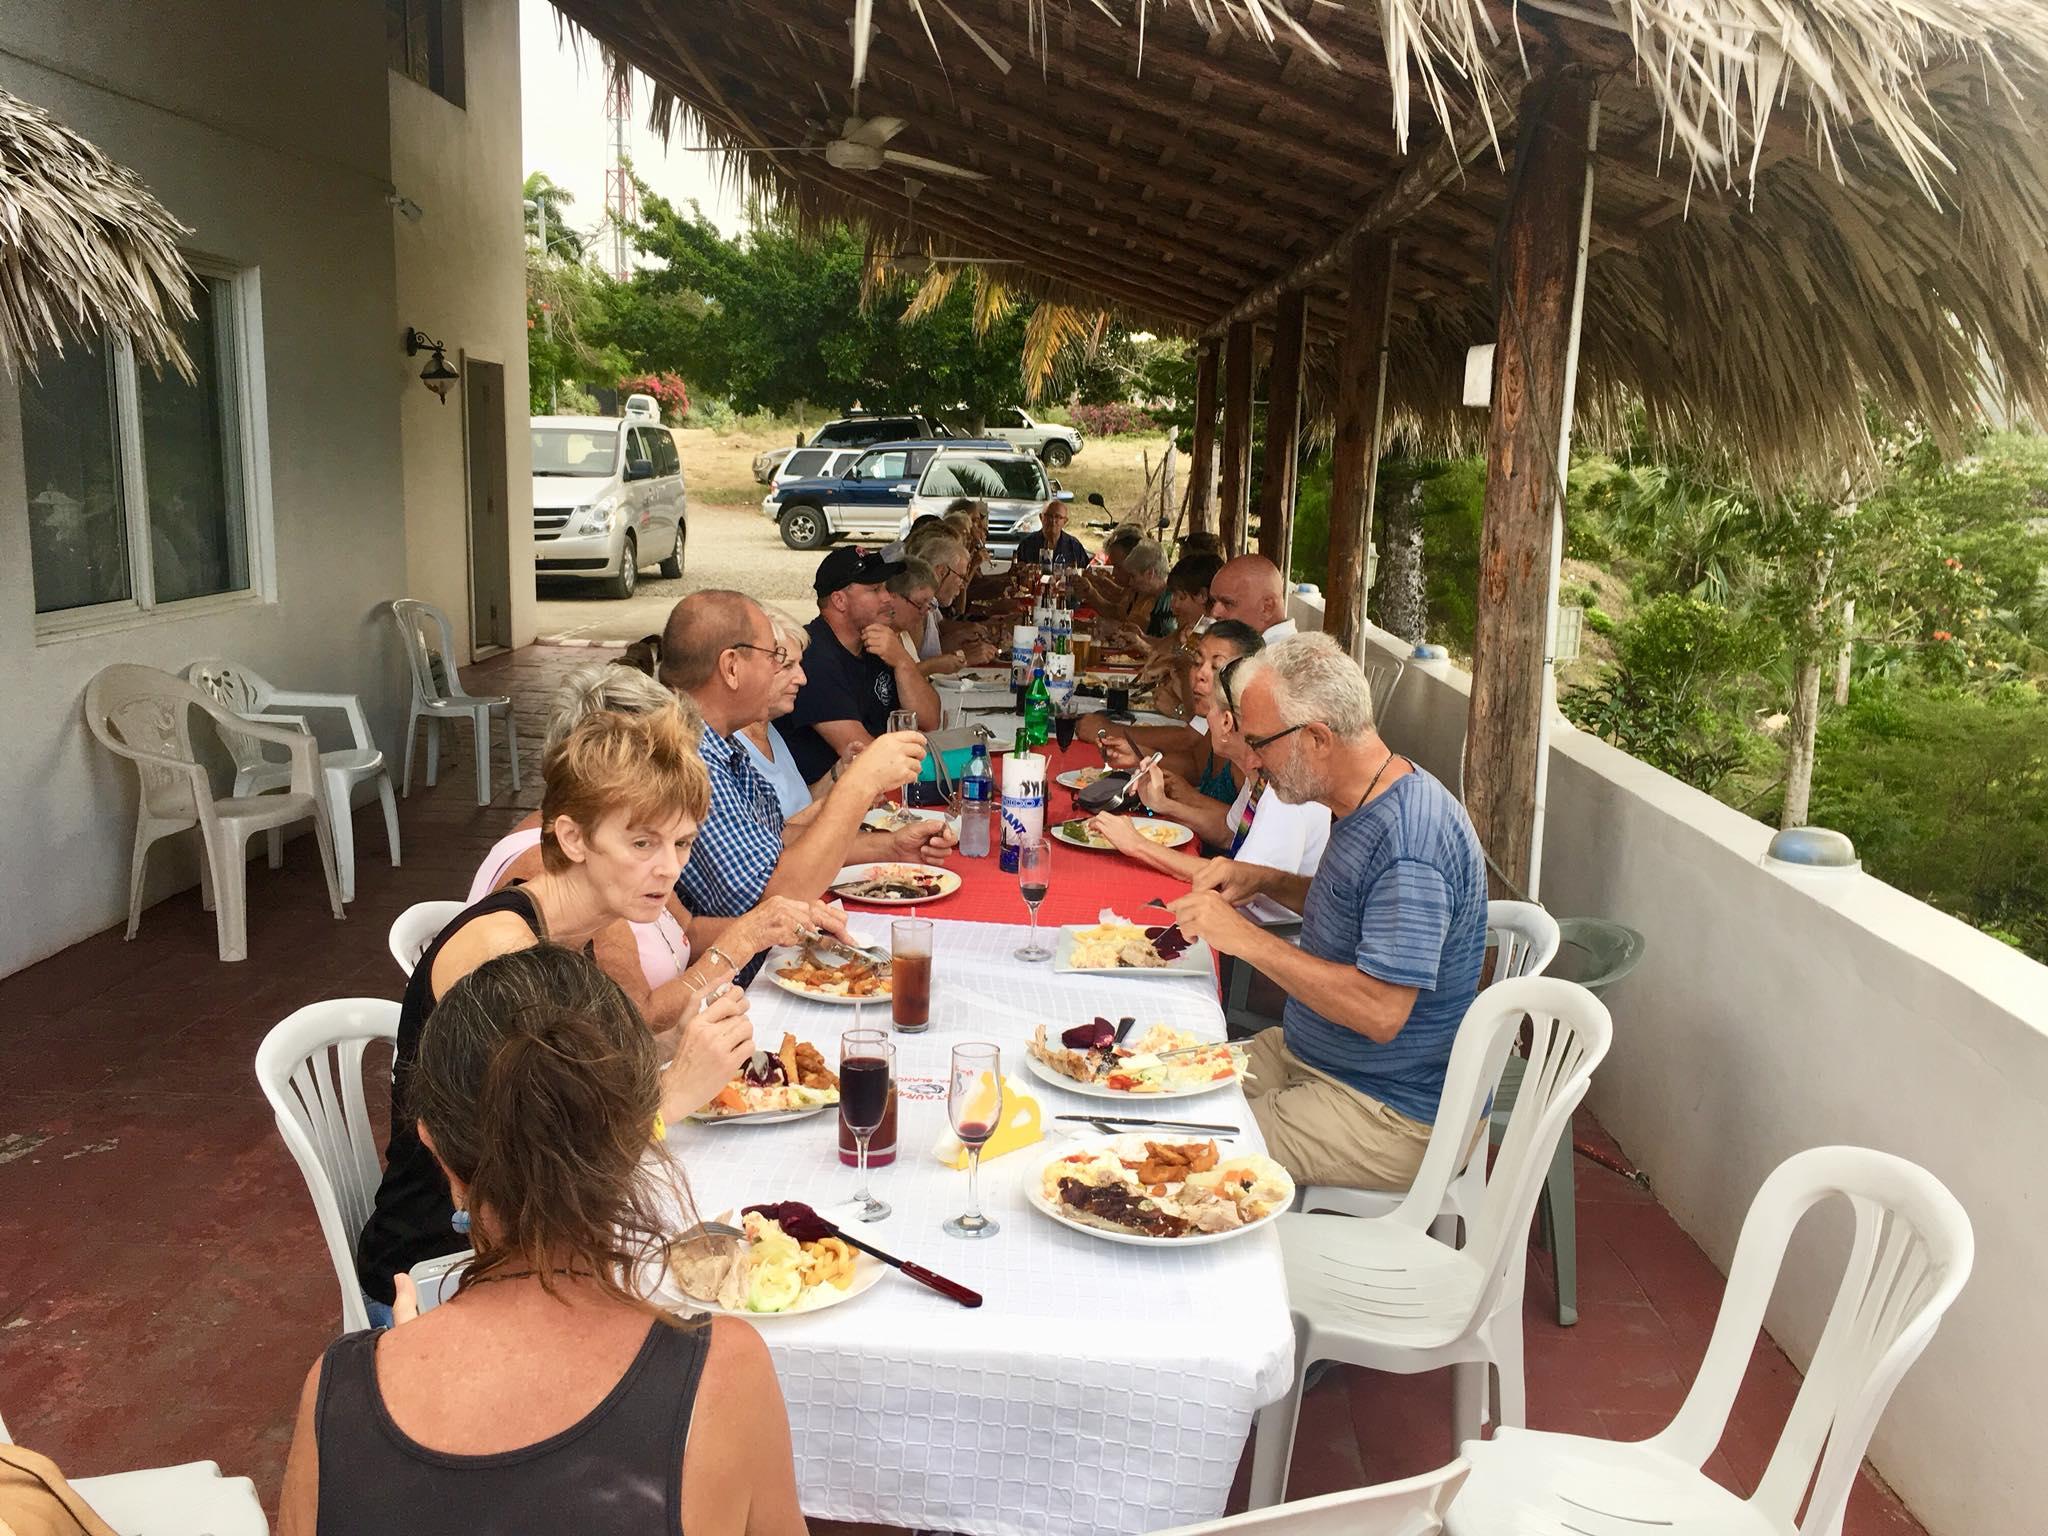 Liveaboard Life Day 91: Saturday Fundraising Gathering in Casa Blanca Restaurant